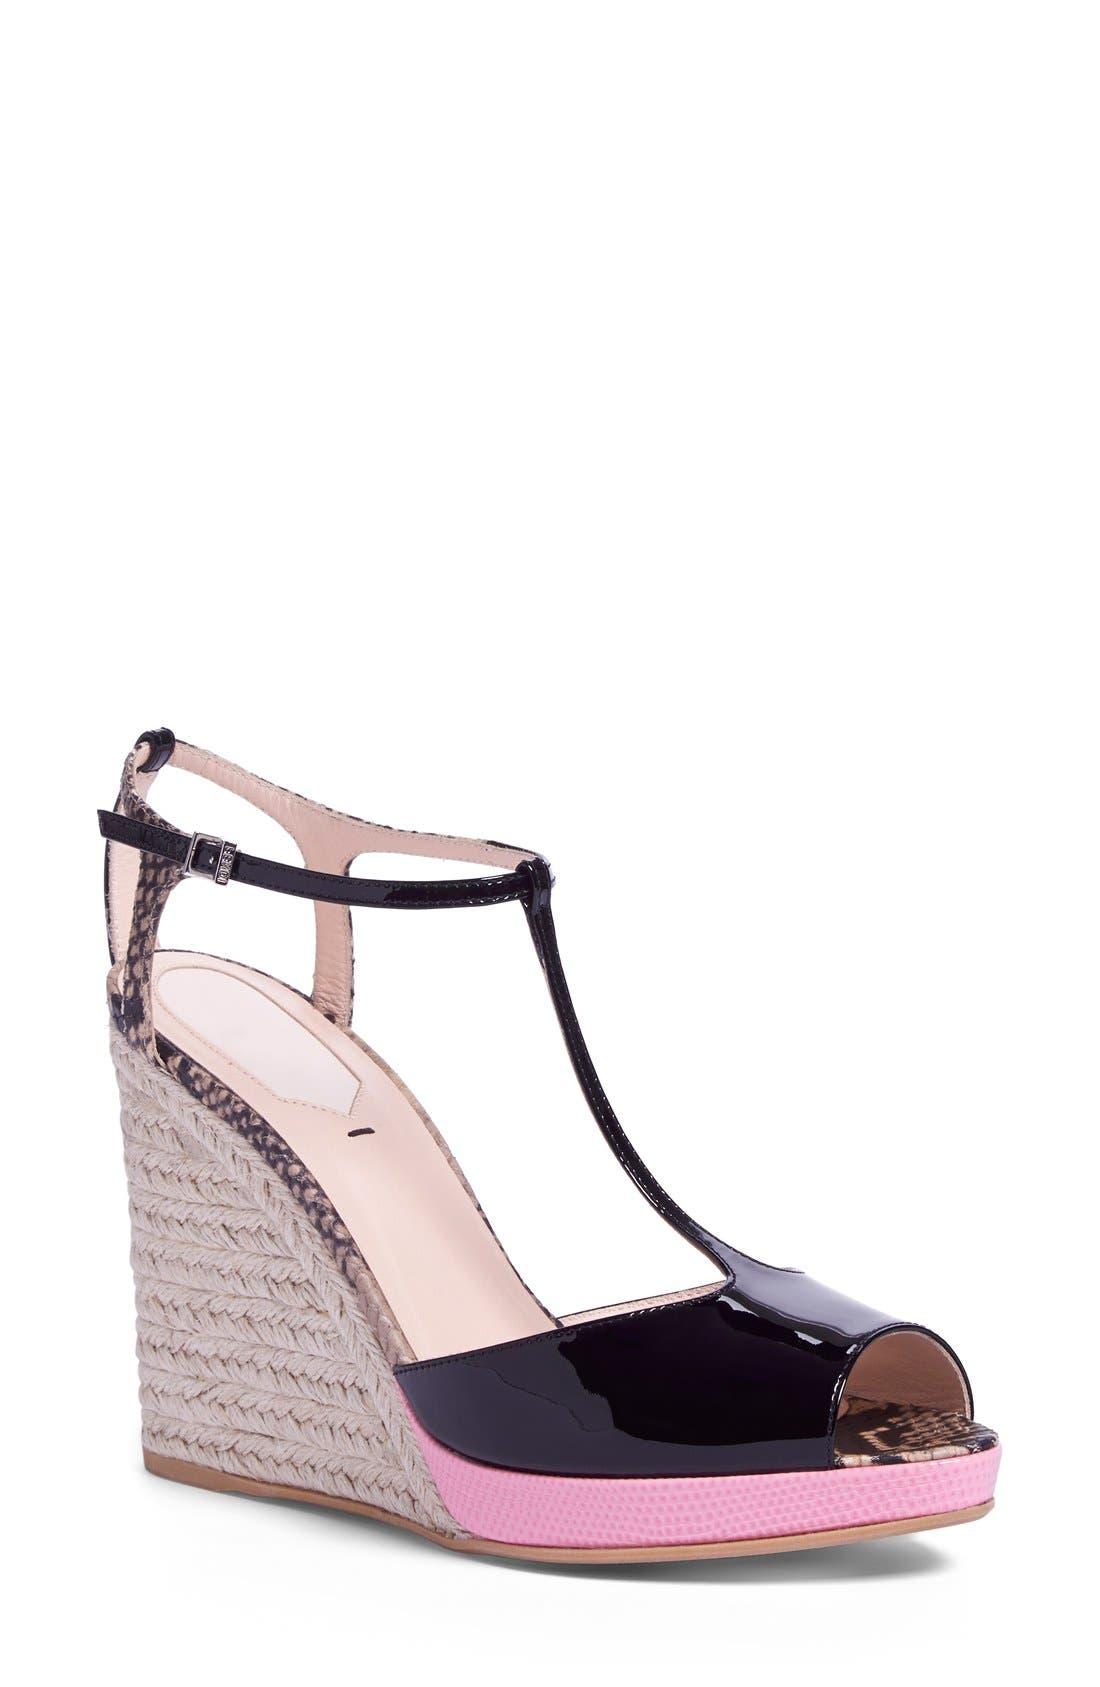 'Elodie' T-Strap Wedge Sandal,                         Main,                         color, Black/ Pink Patent